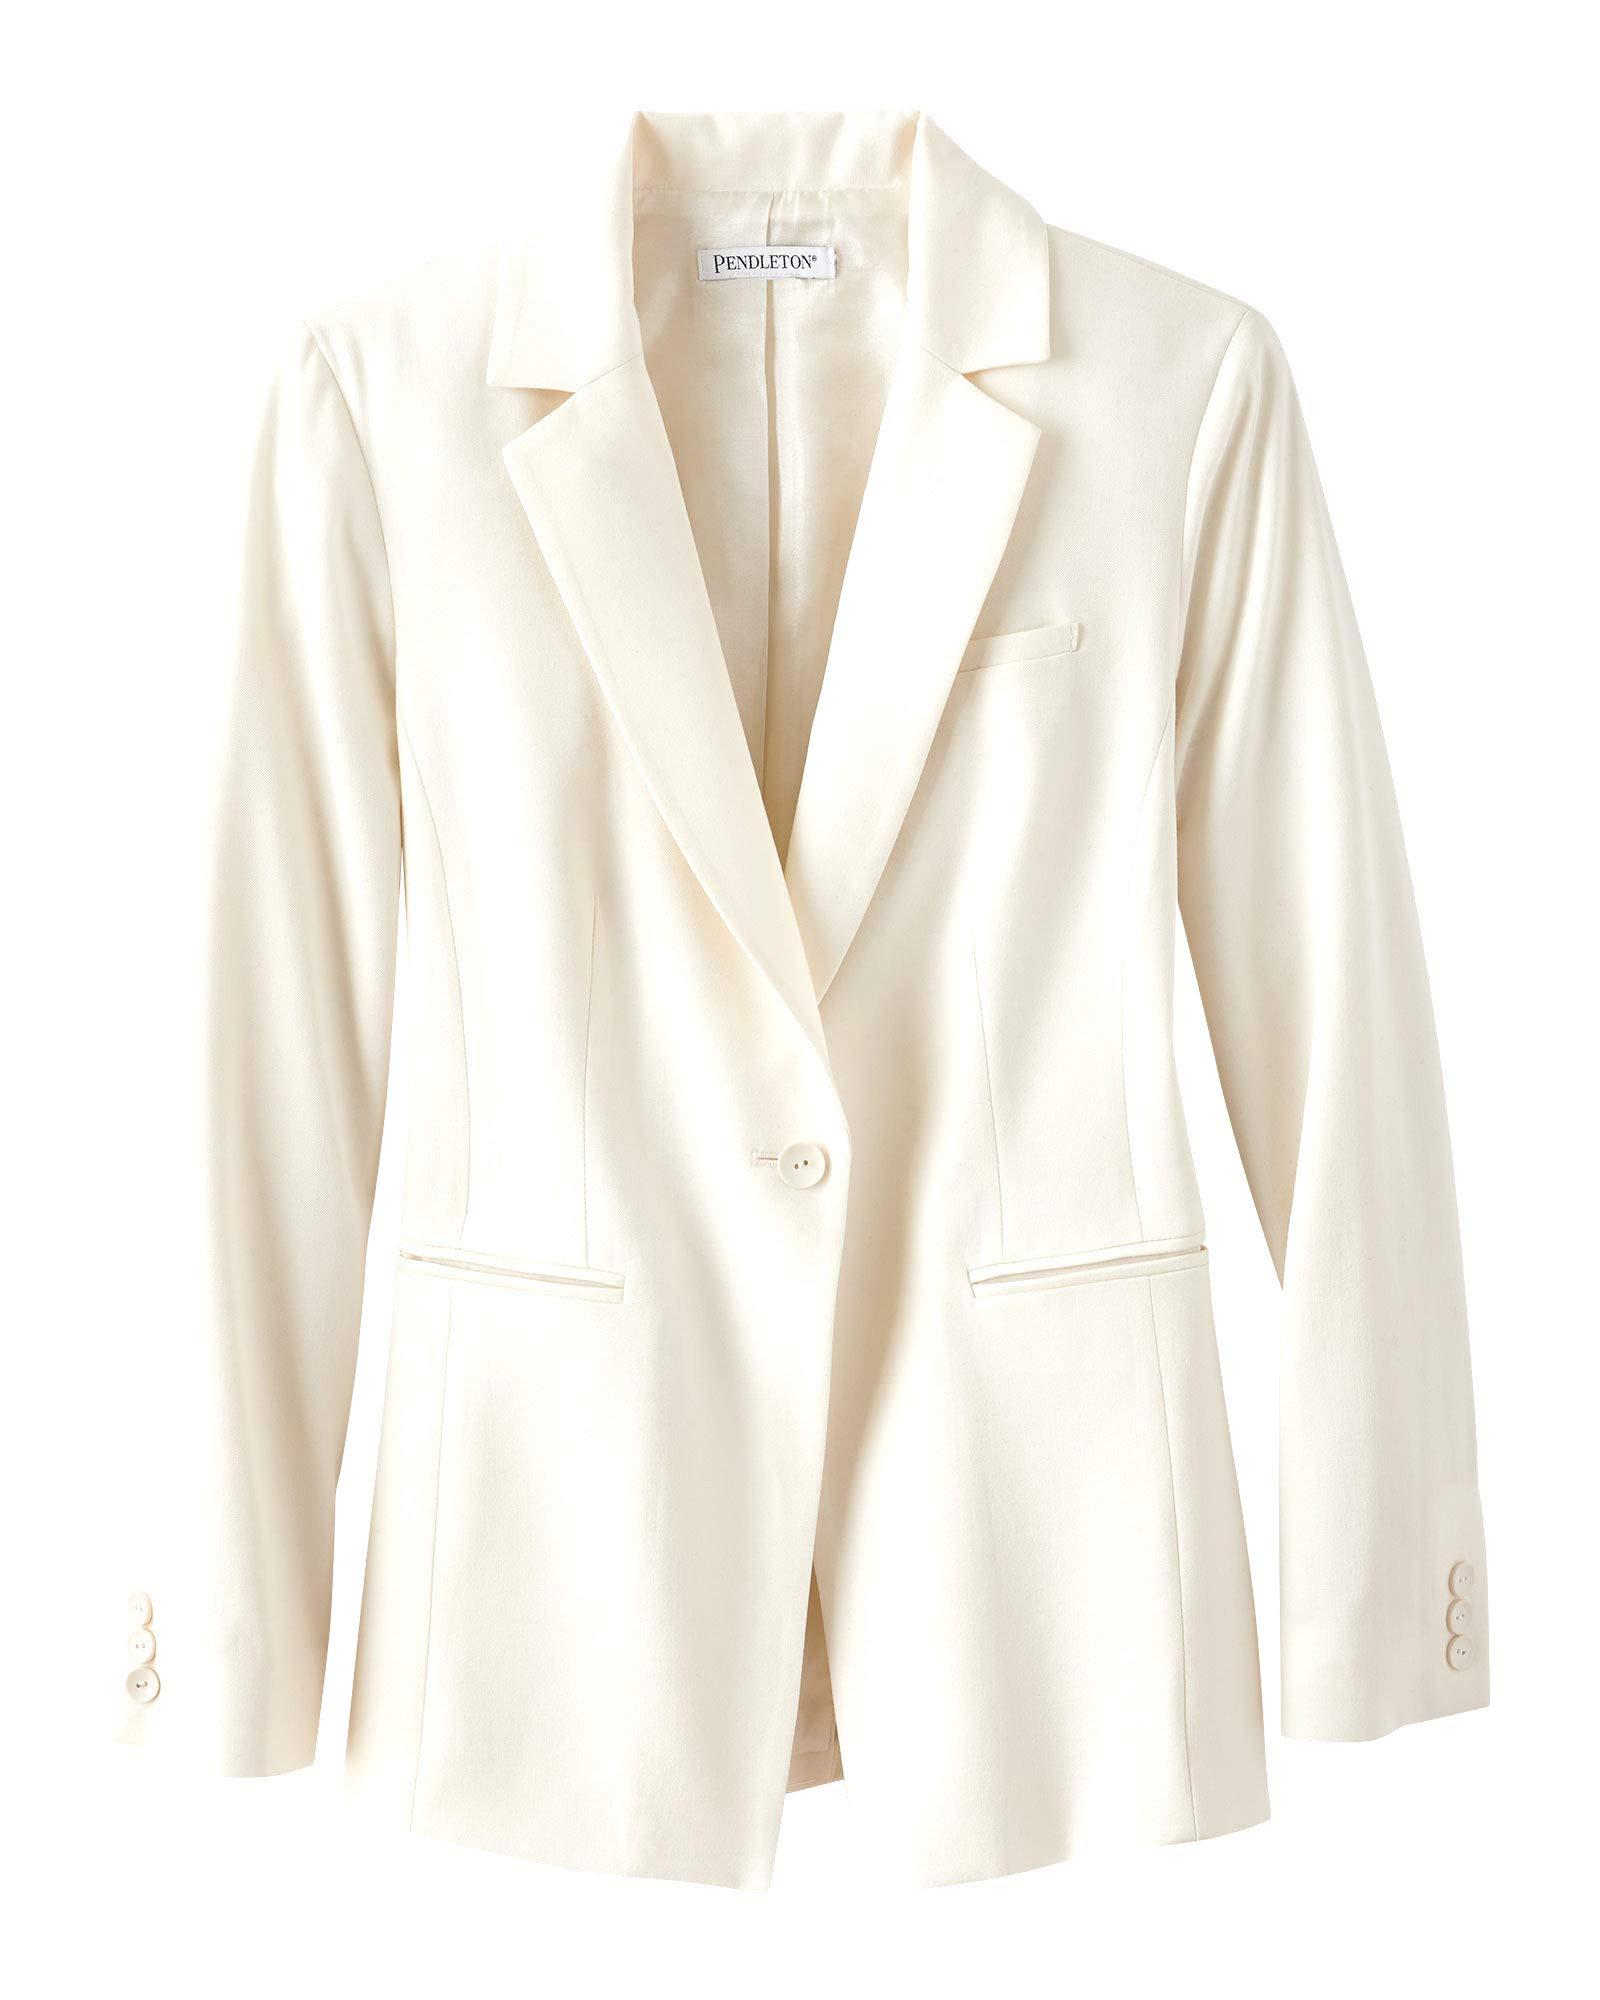 Pendleton Women's One Button Wool Gabardine Jacket